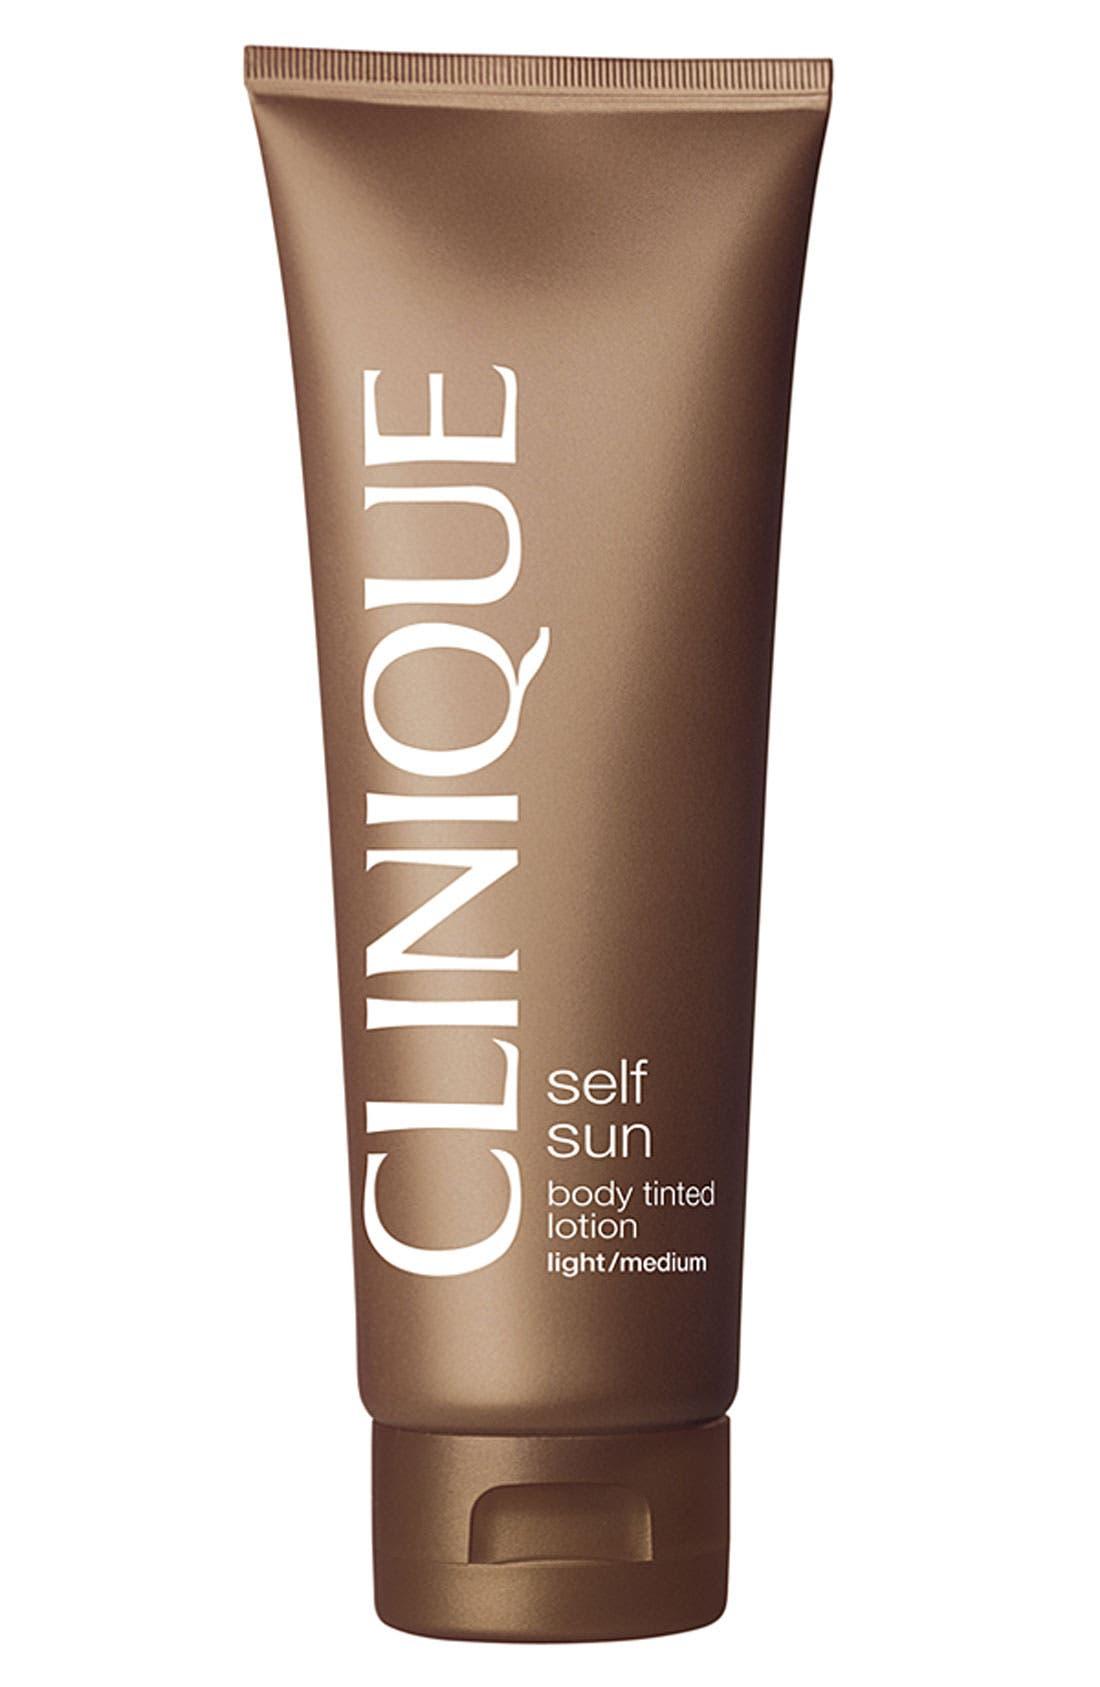 CLINIQUE, Self Sun Body Tinted Lotion, Main thumbnail 1, color, LIGHT/MEDIUM